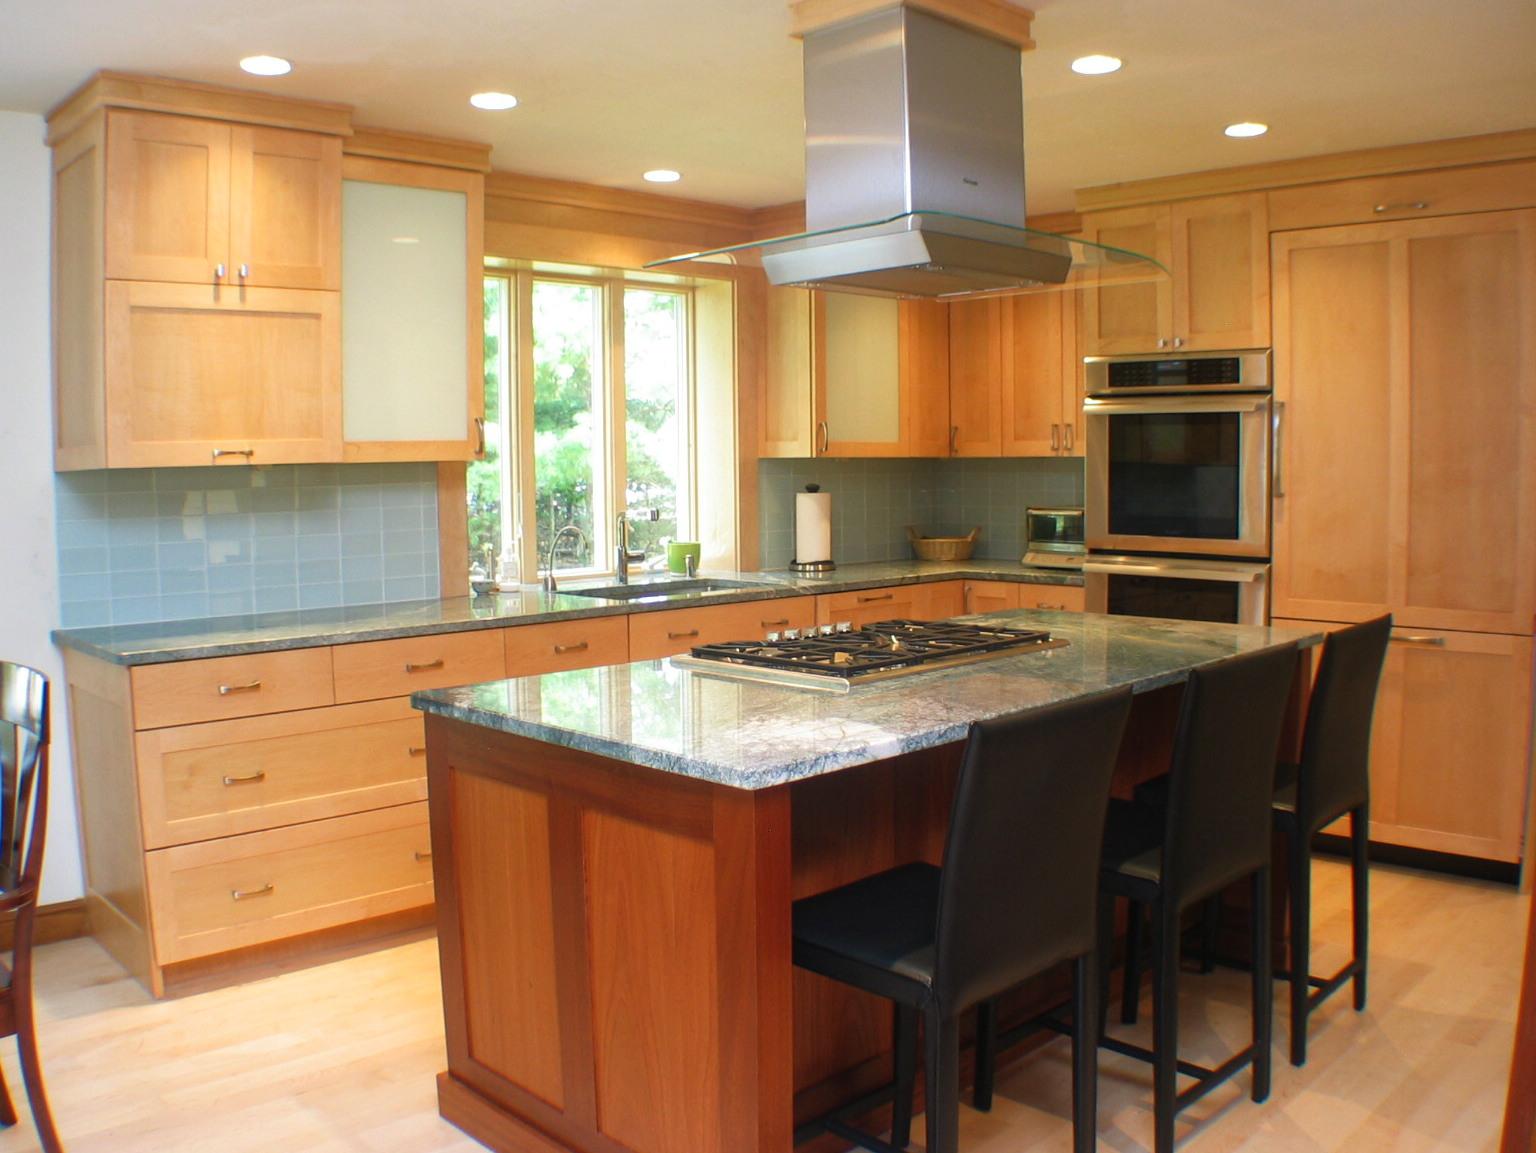 Custom Cabinet Maker Woodworker And Cabinets Sudbury Massachusetts